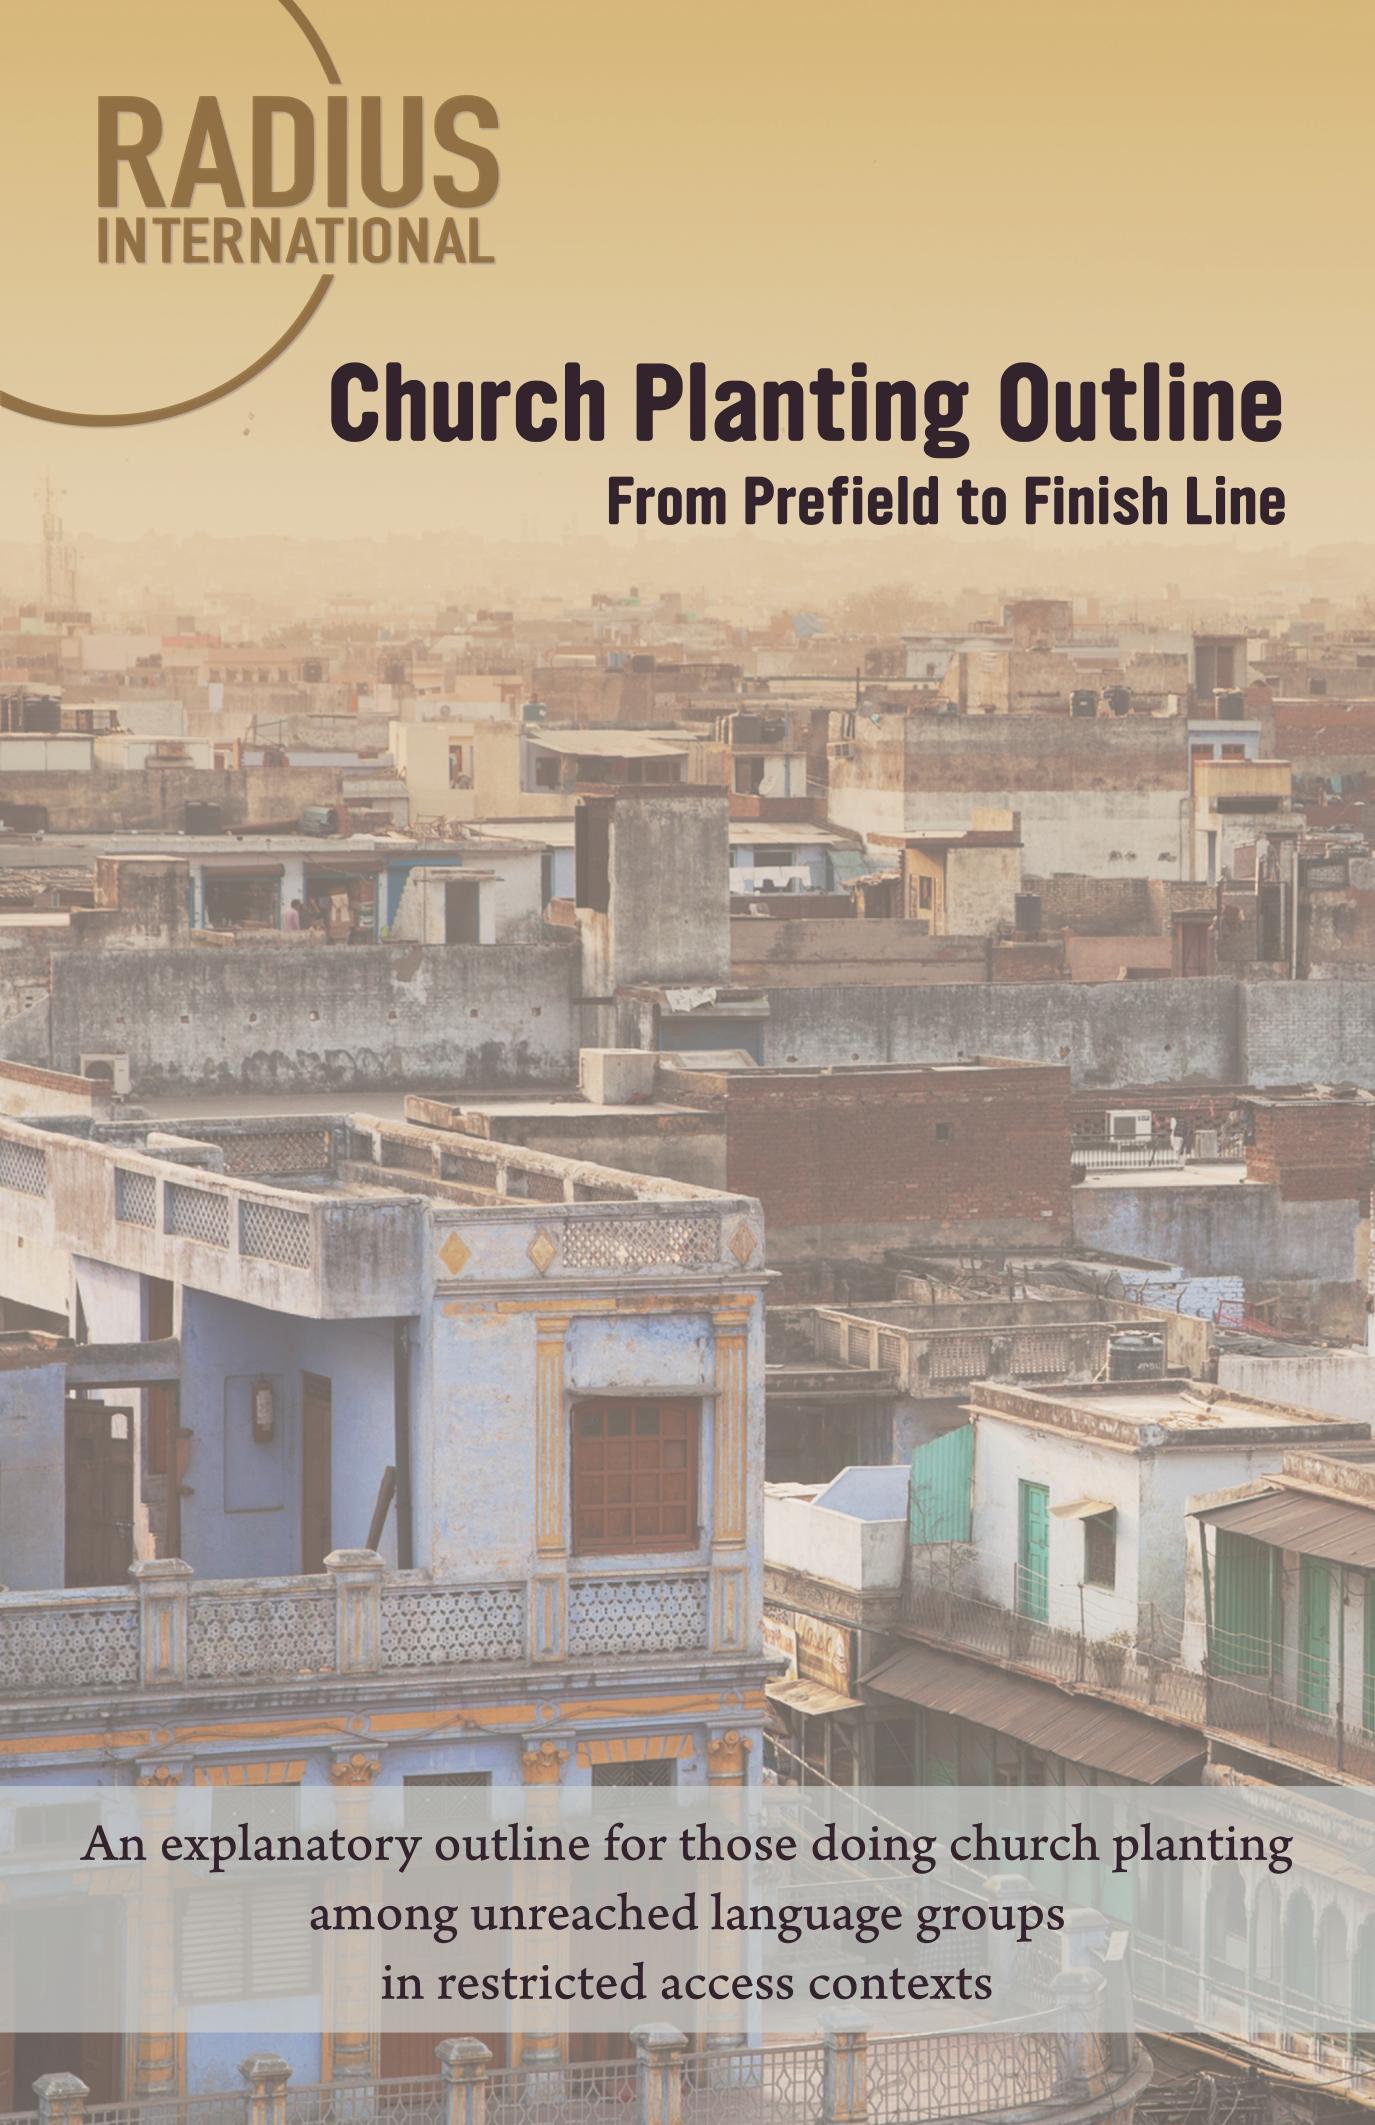 Radius Church Planting Outline